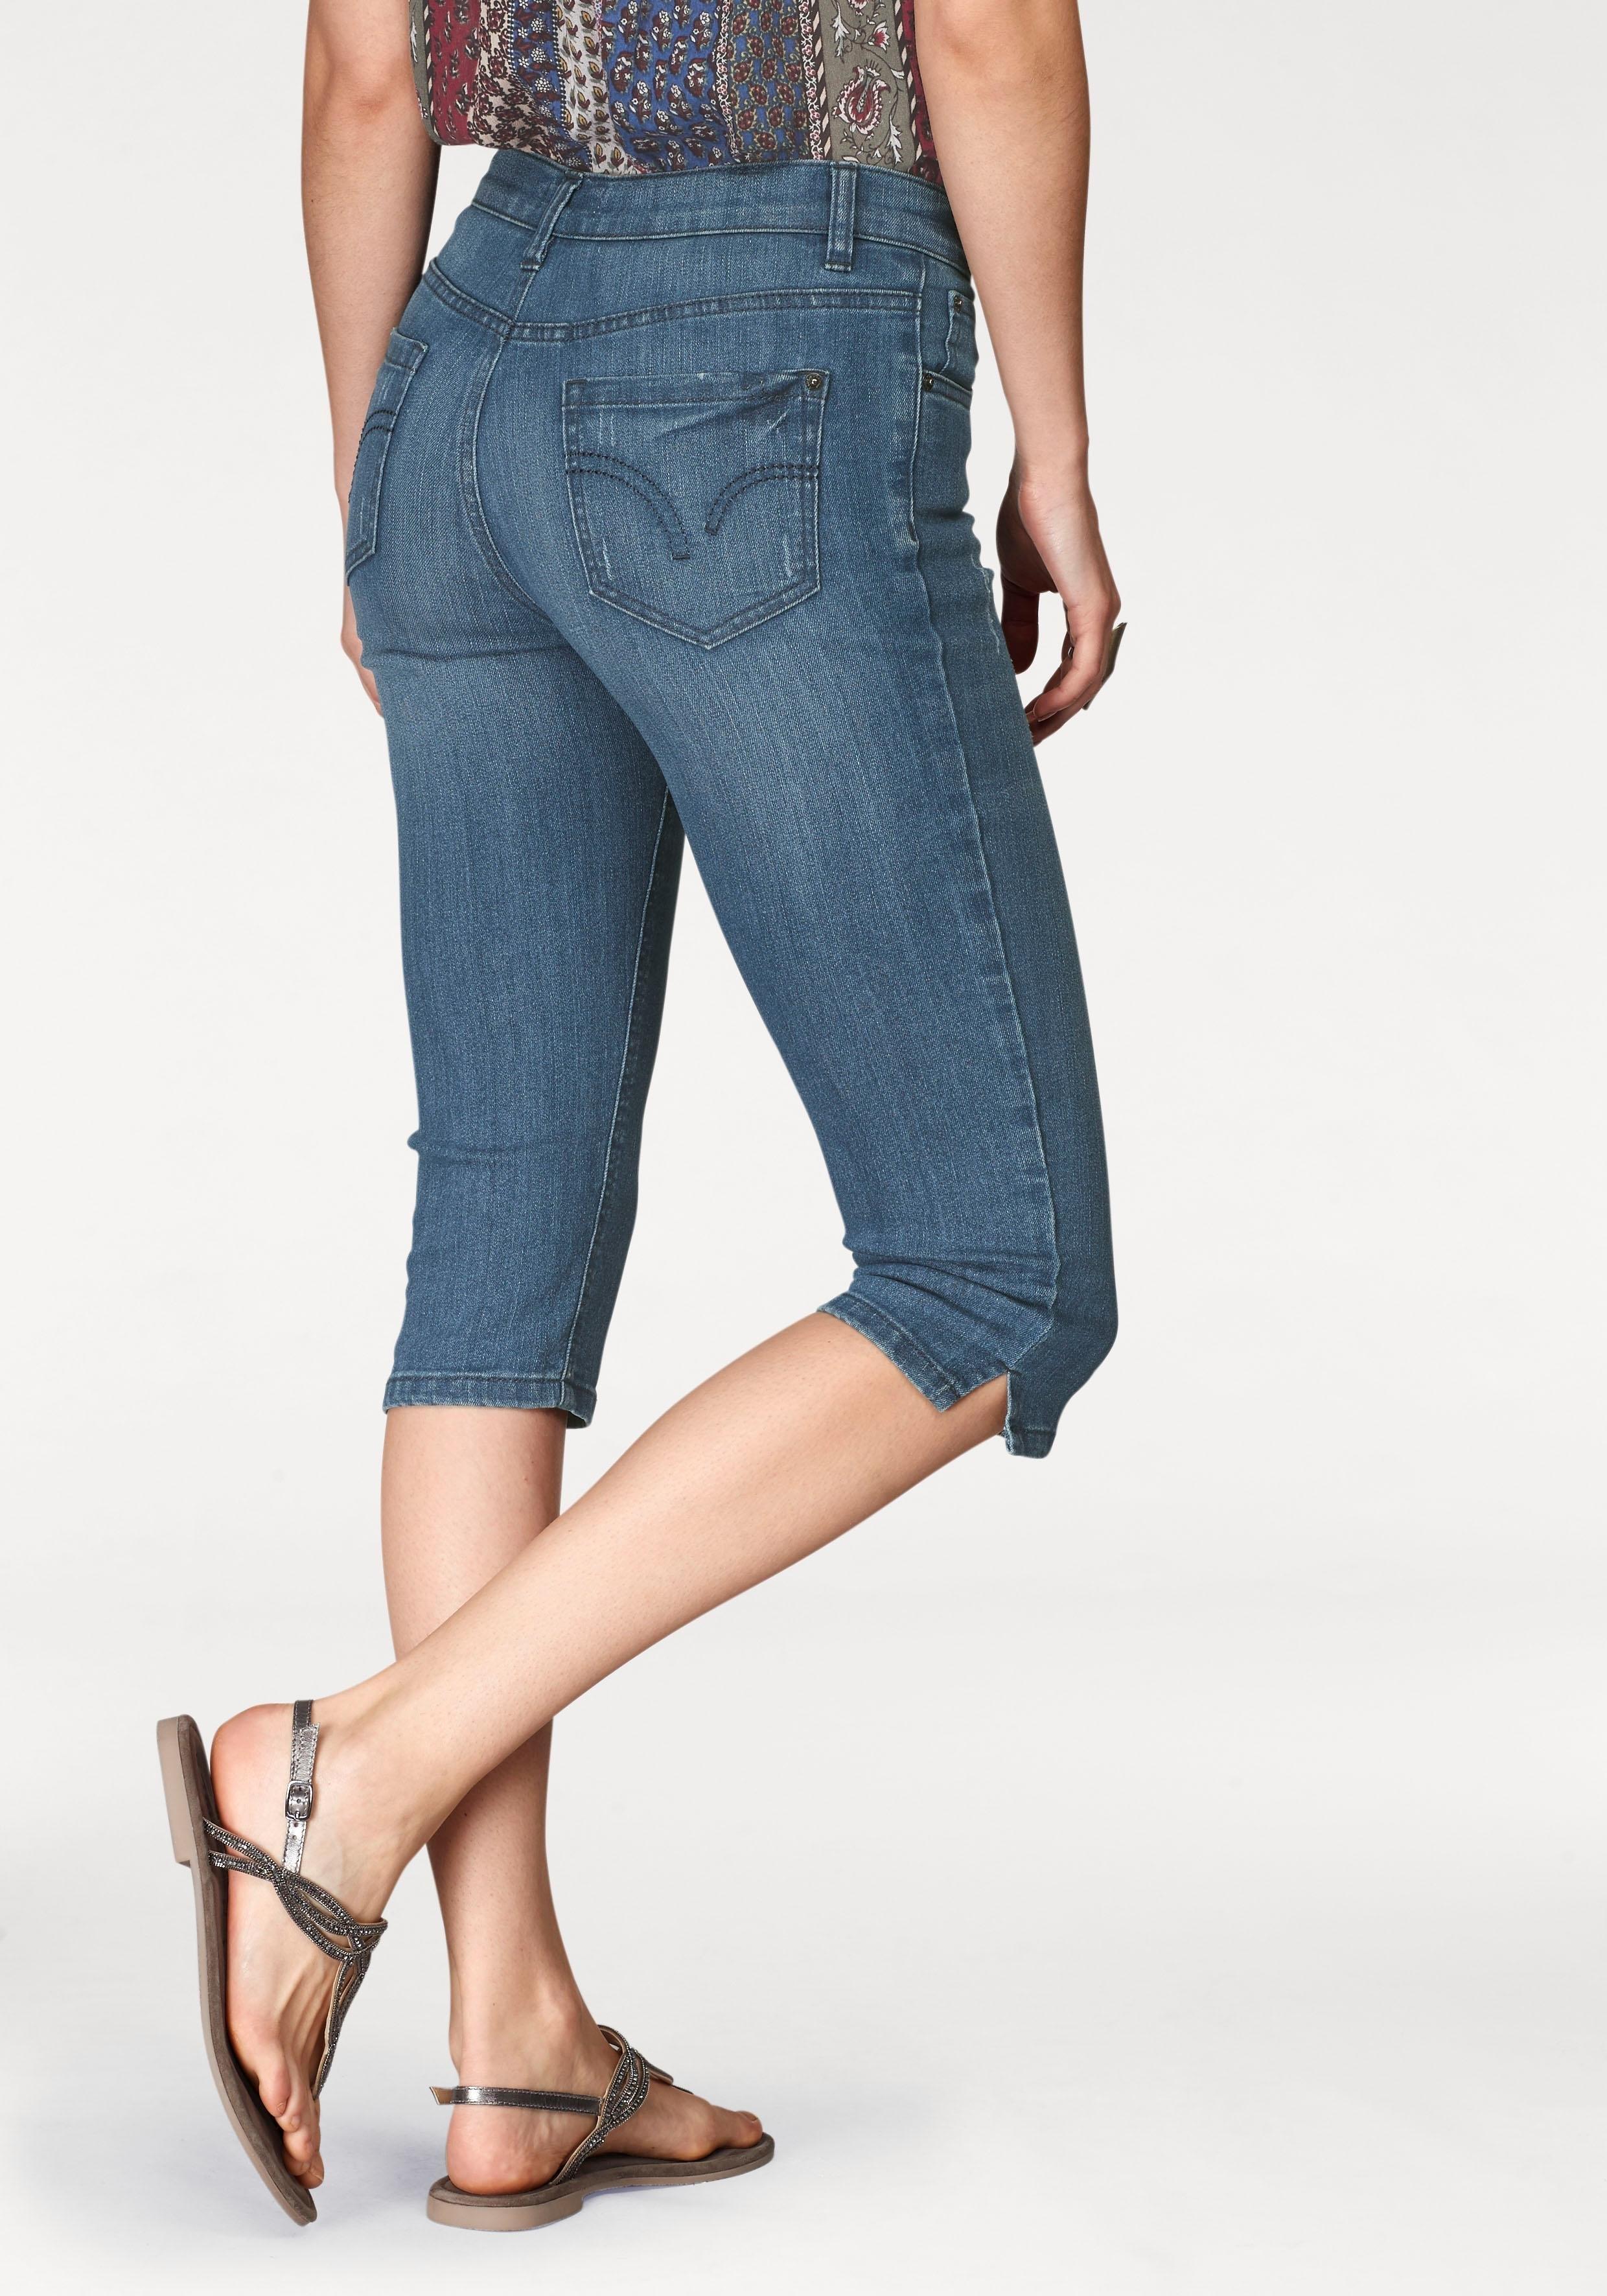 Aniston Casual Aniston capri jeans online kopen op otto.nl